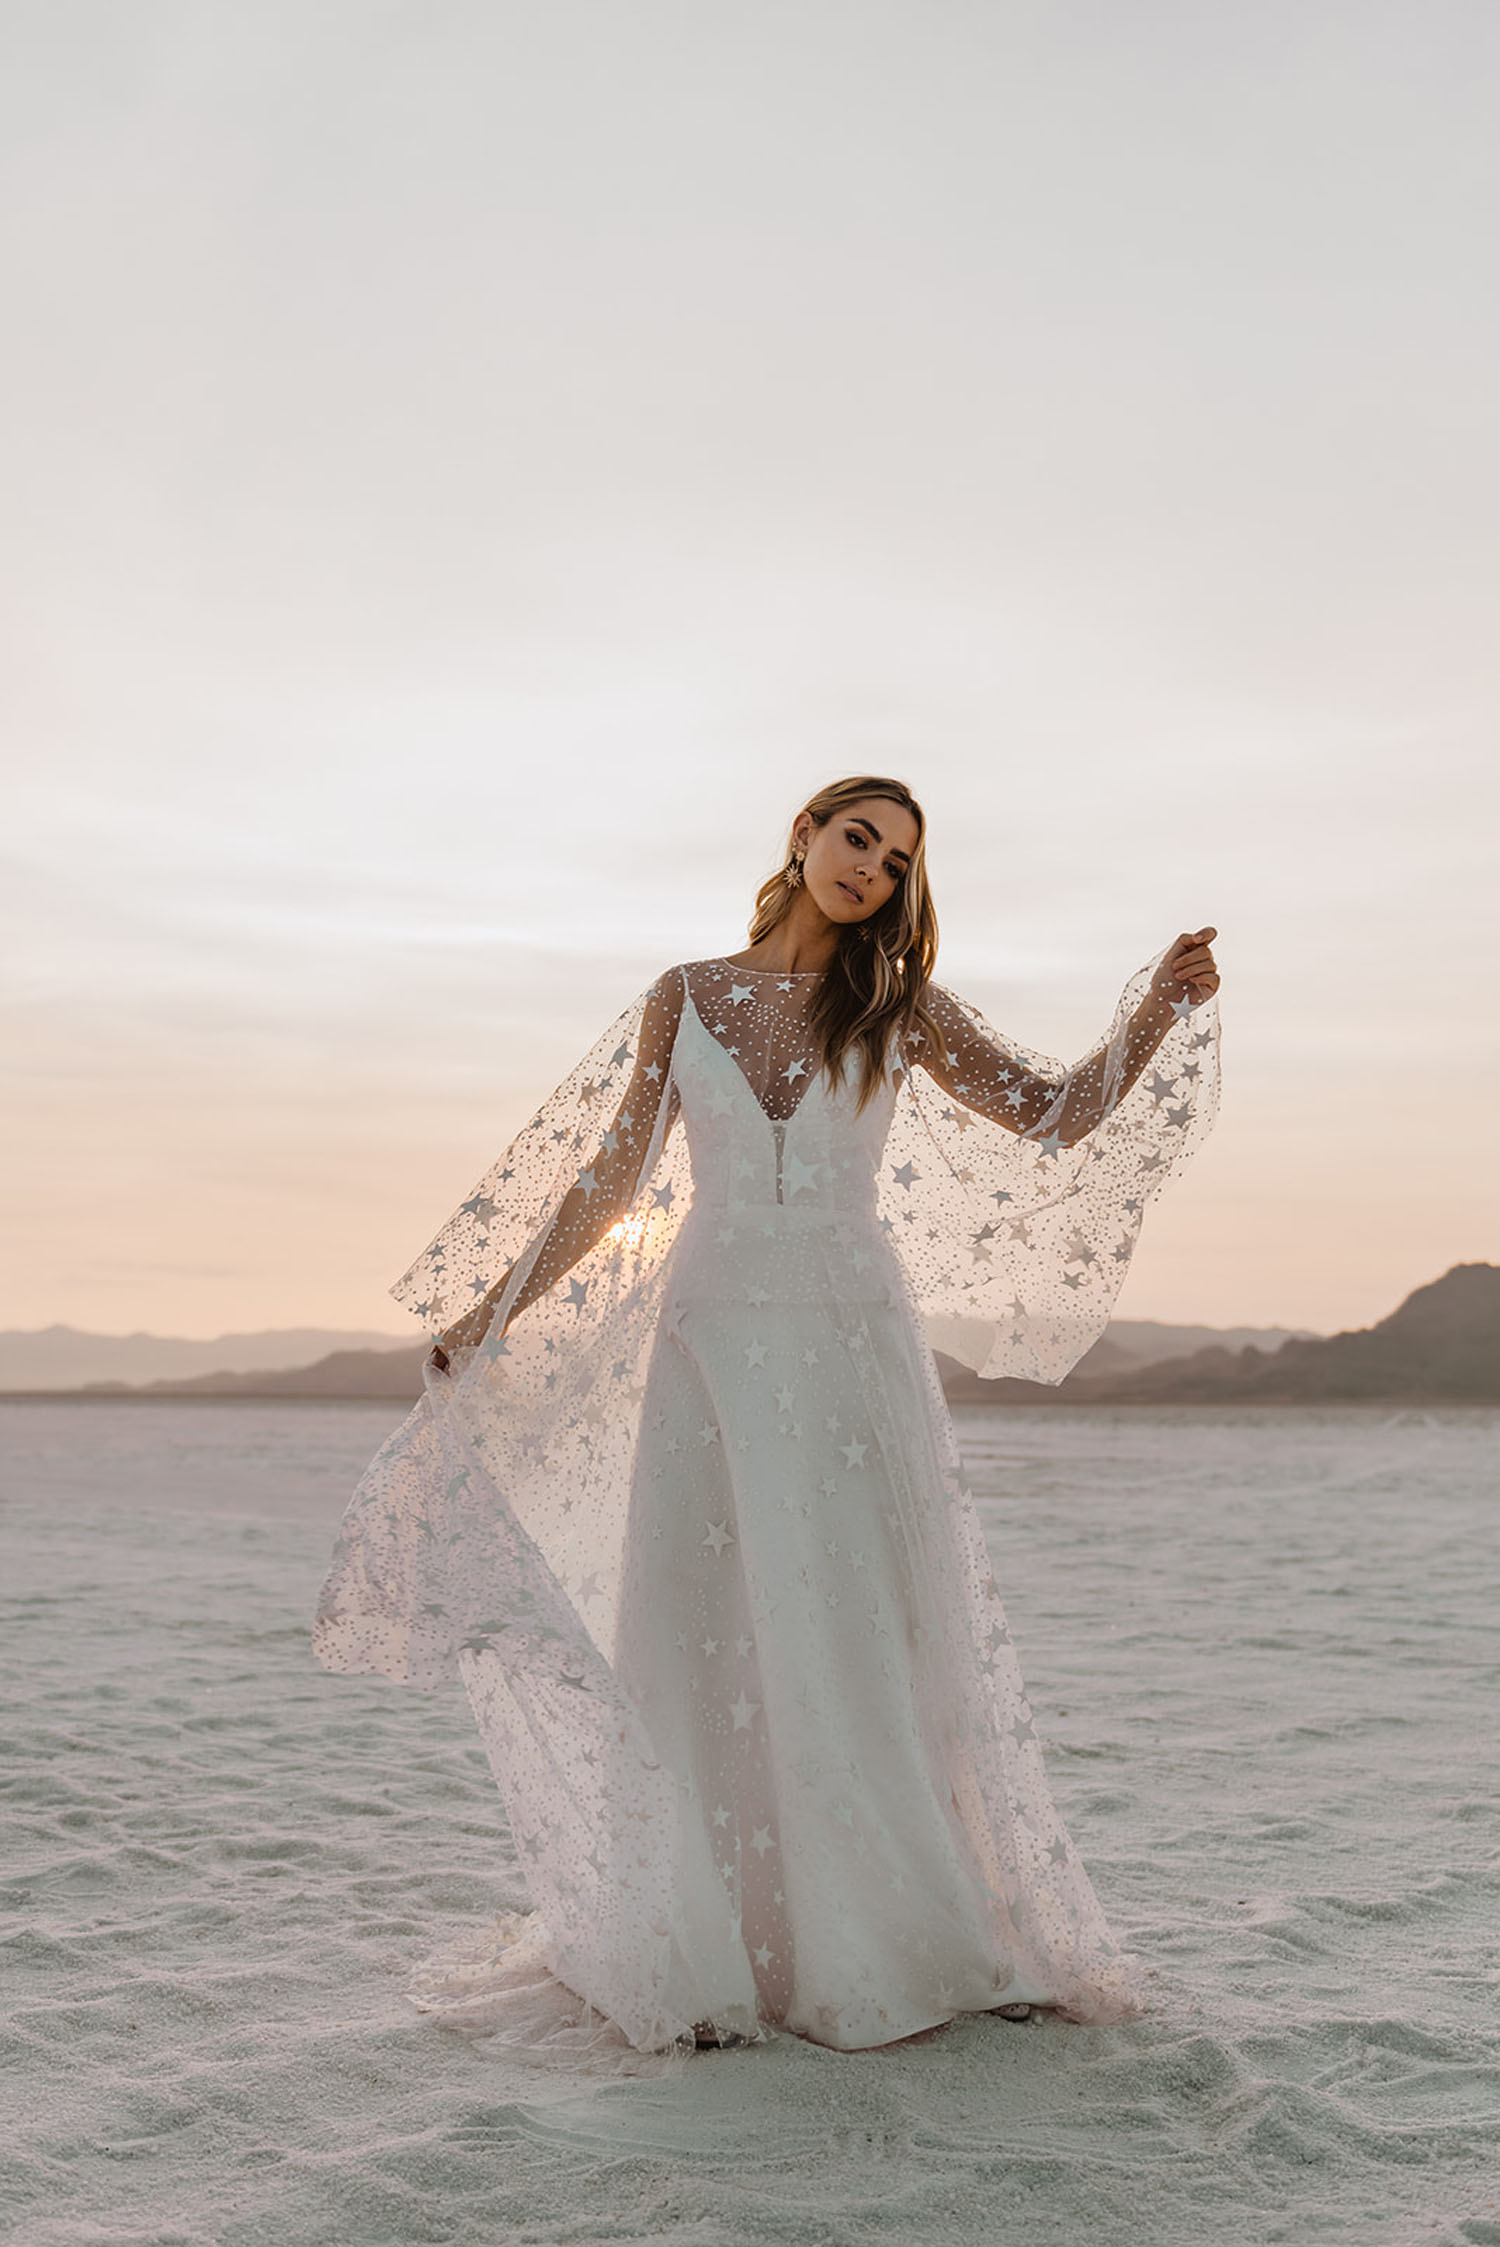 The Bespoke Bride Dress